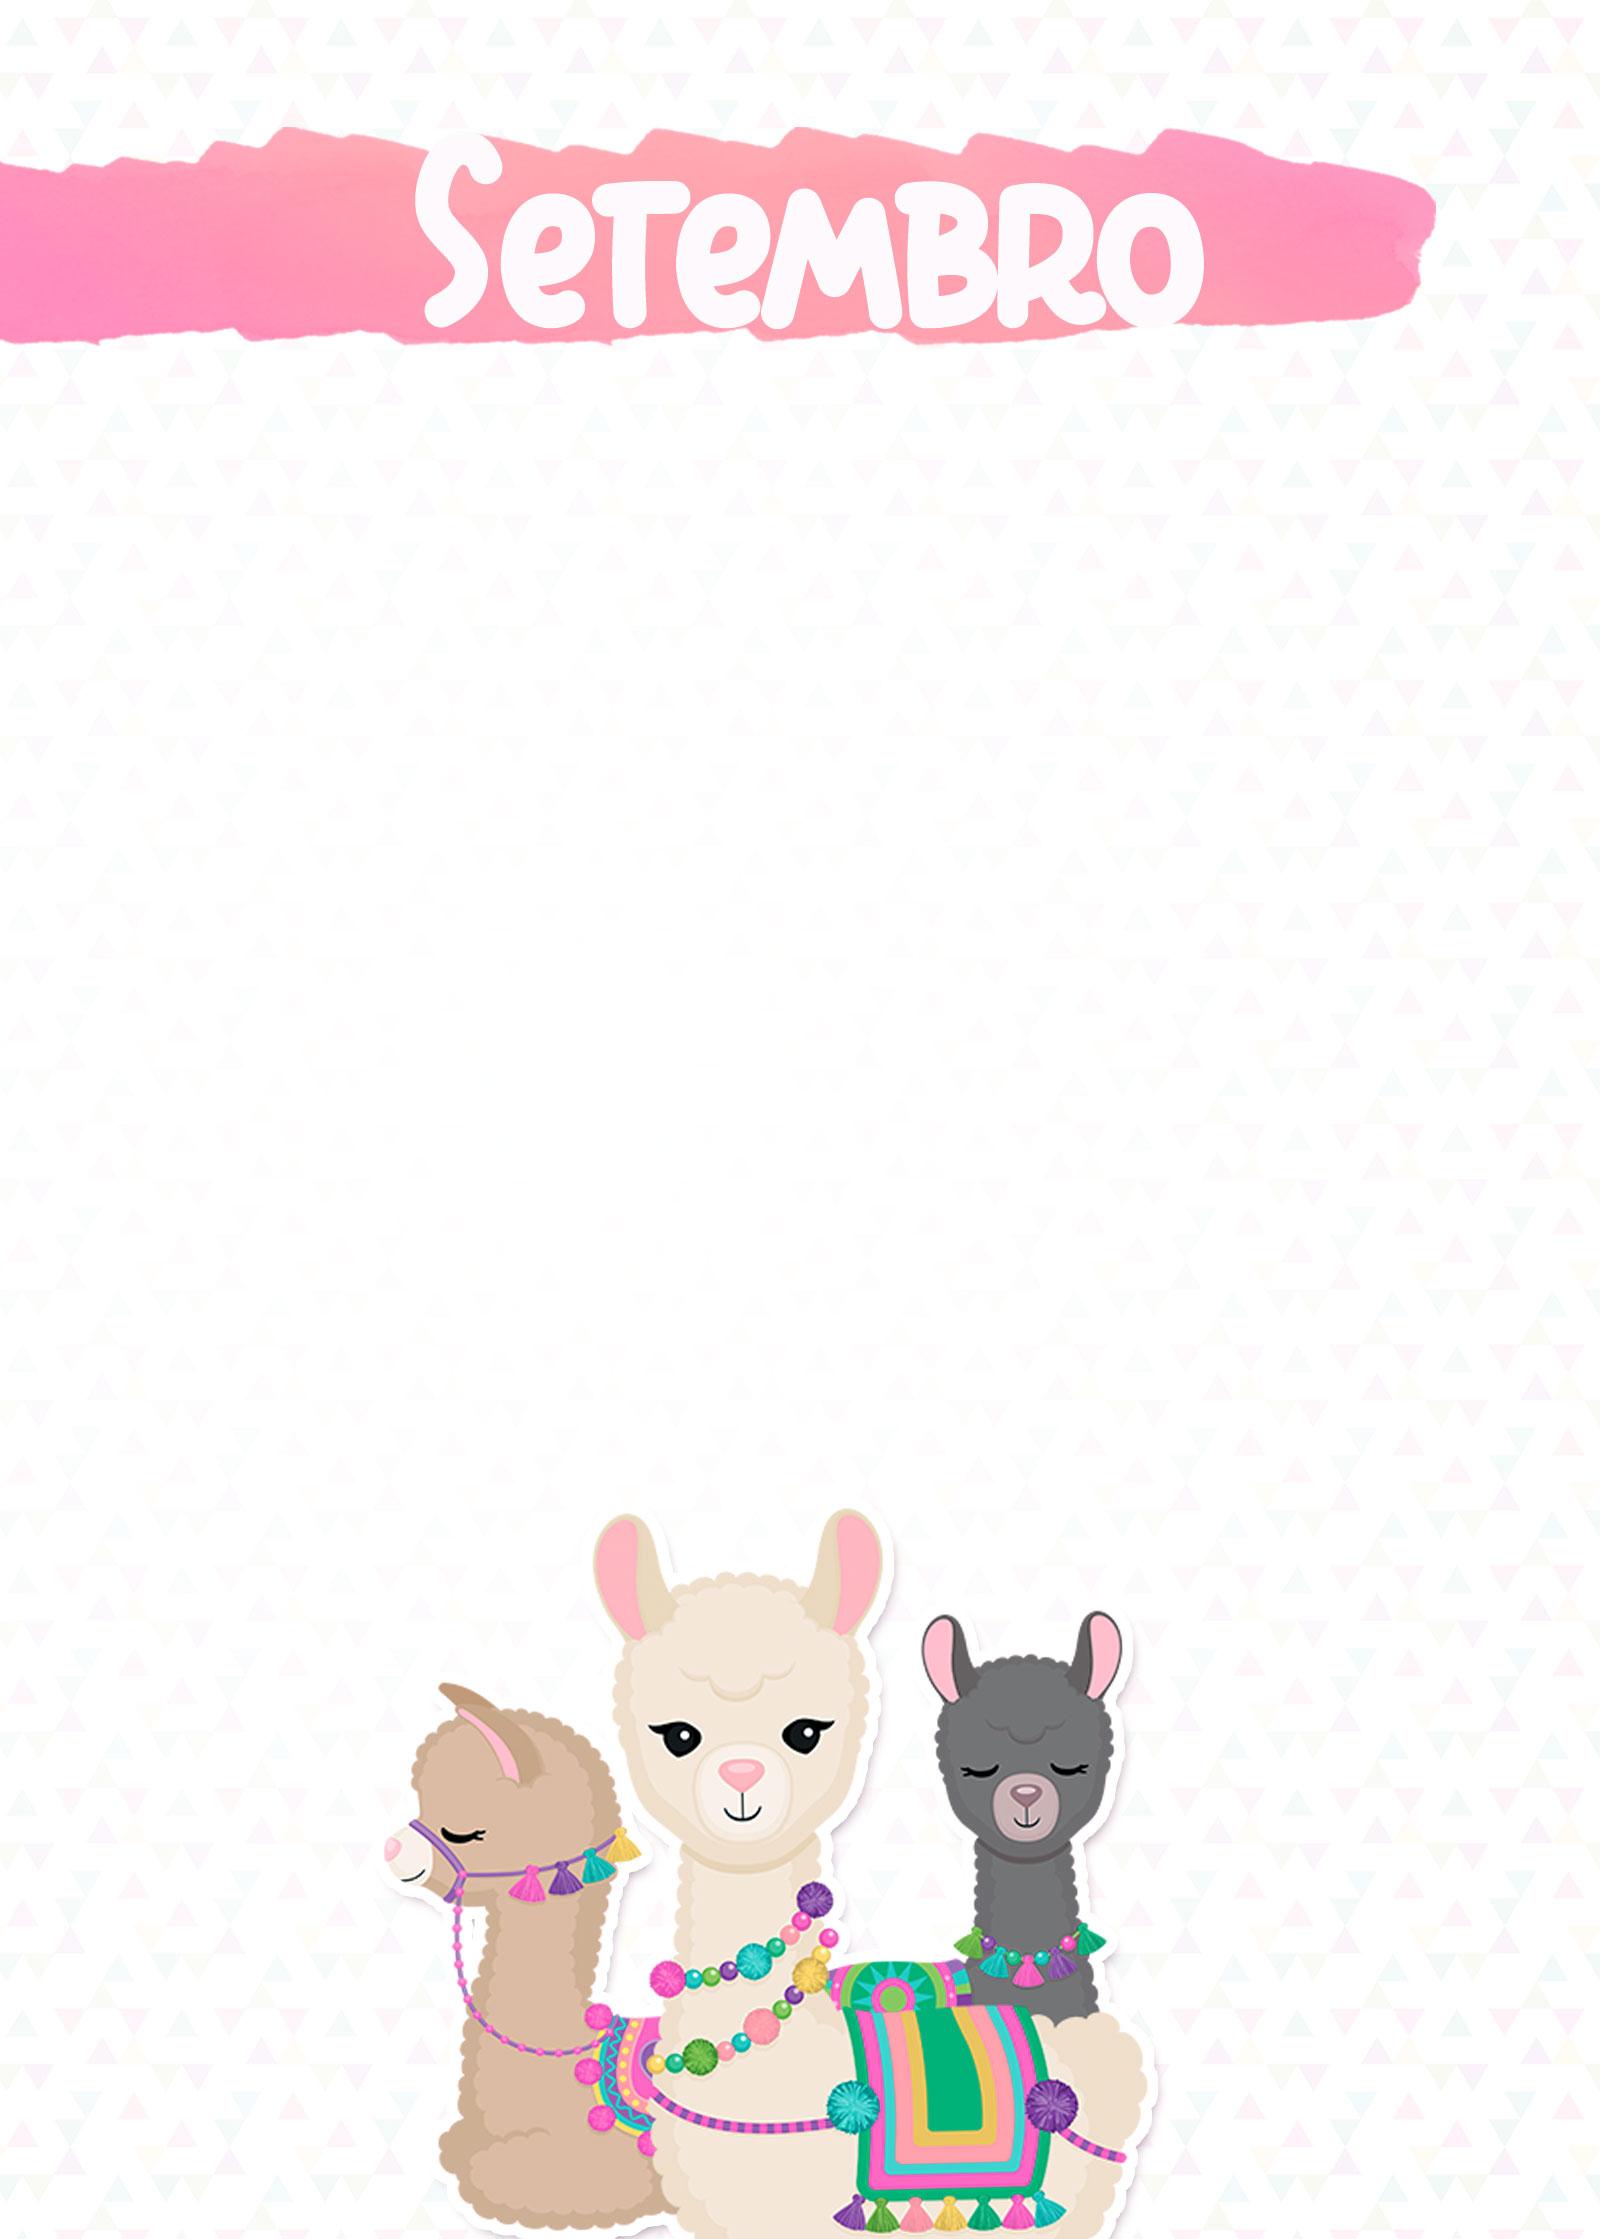 Planner Lhama Rosa 2019 capa setembro